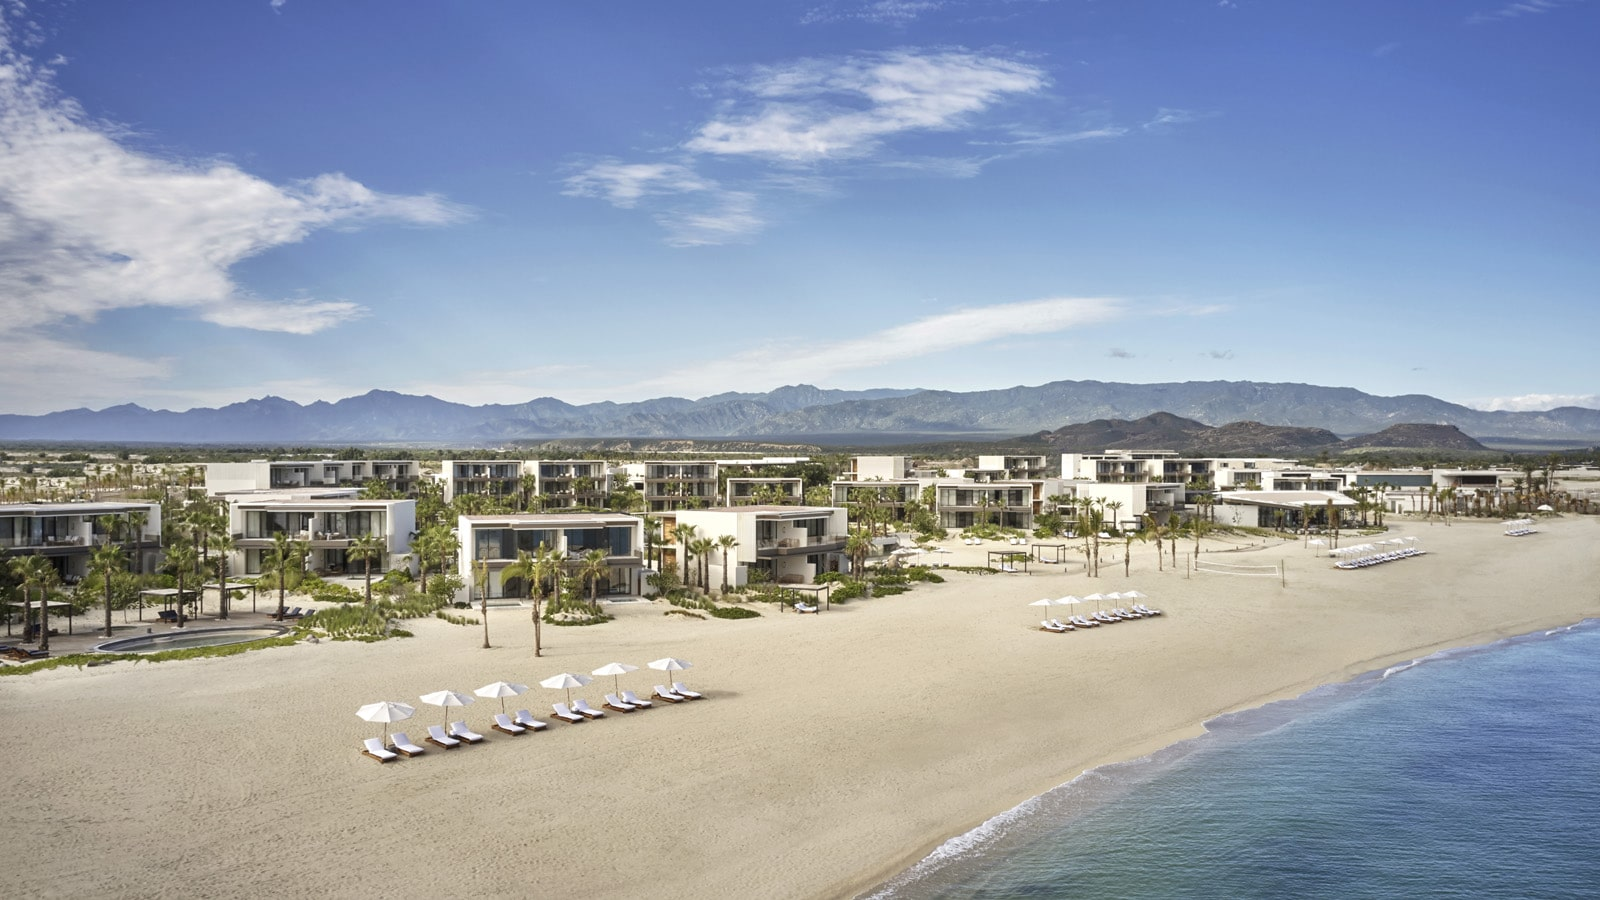 Four-Seasons-Resort-and-Residences-Los-Cabos-At-Costa-Palmas